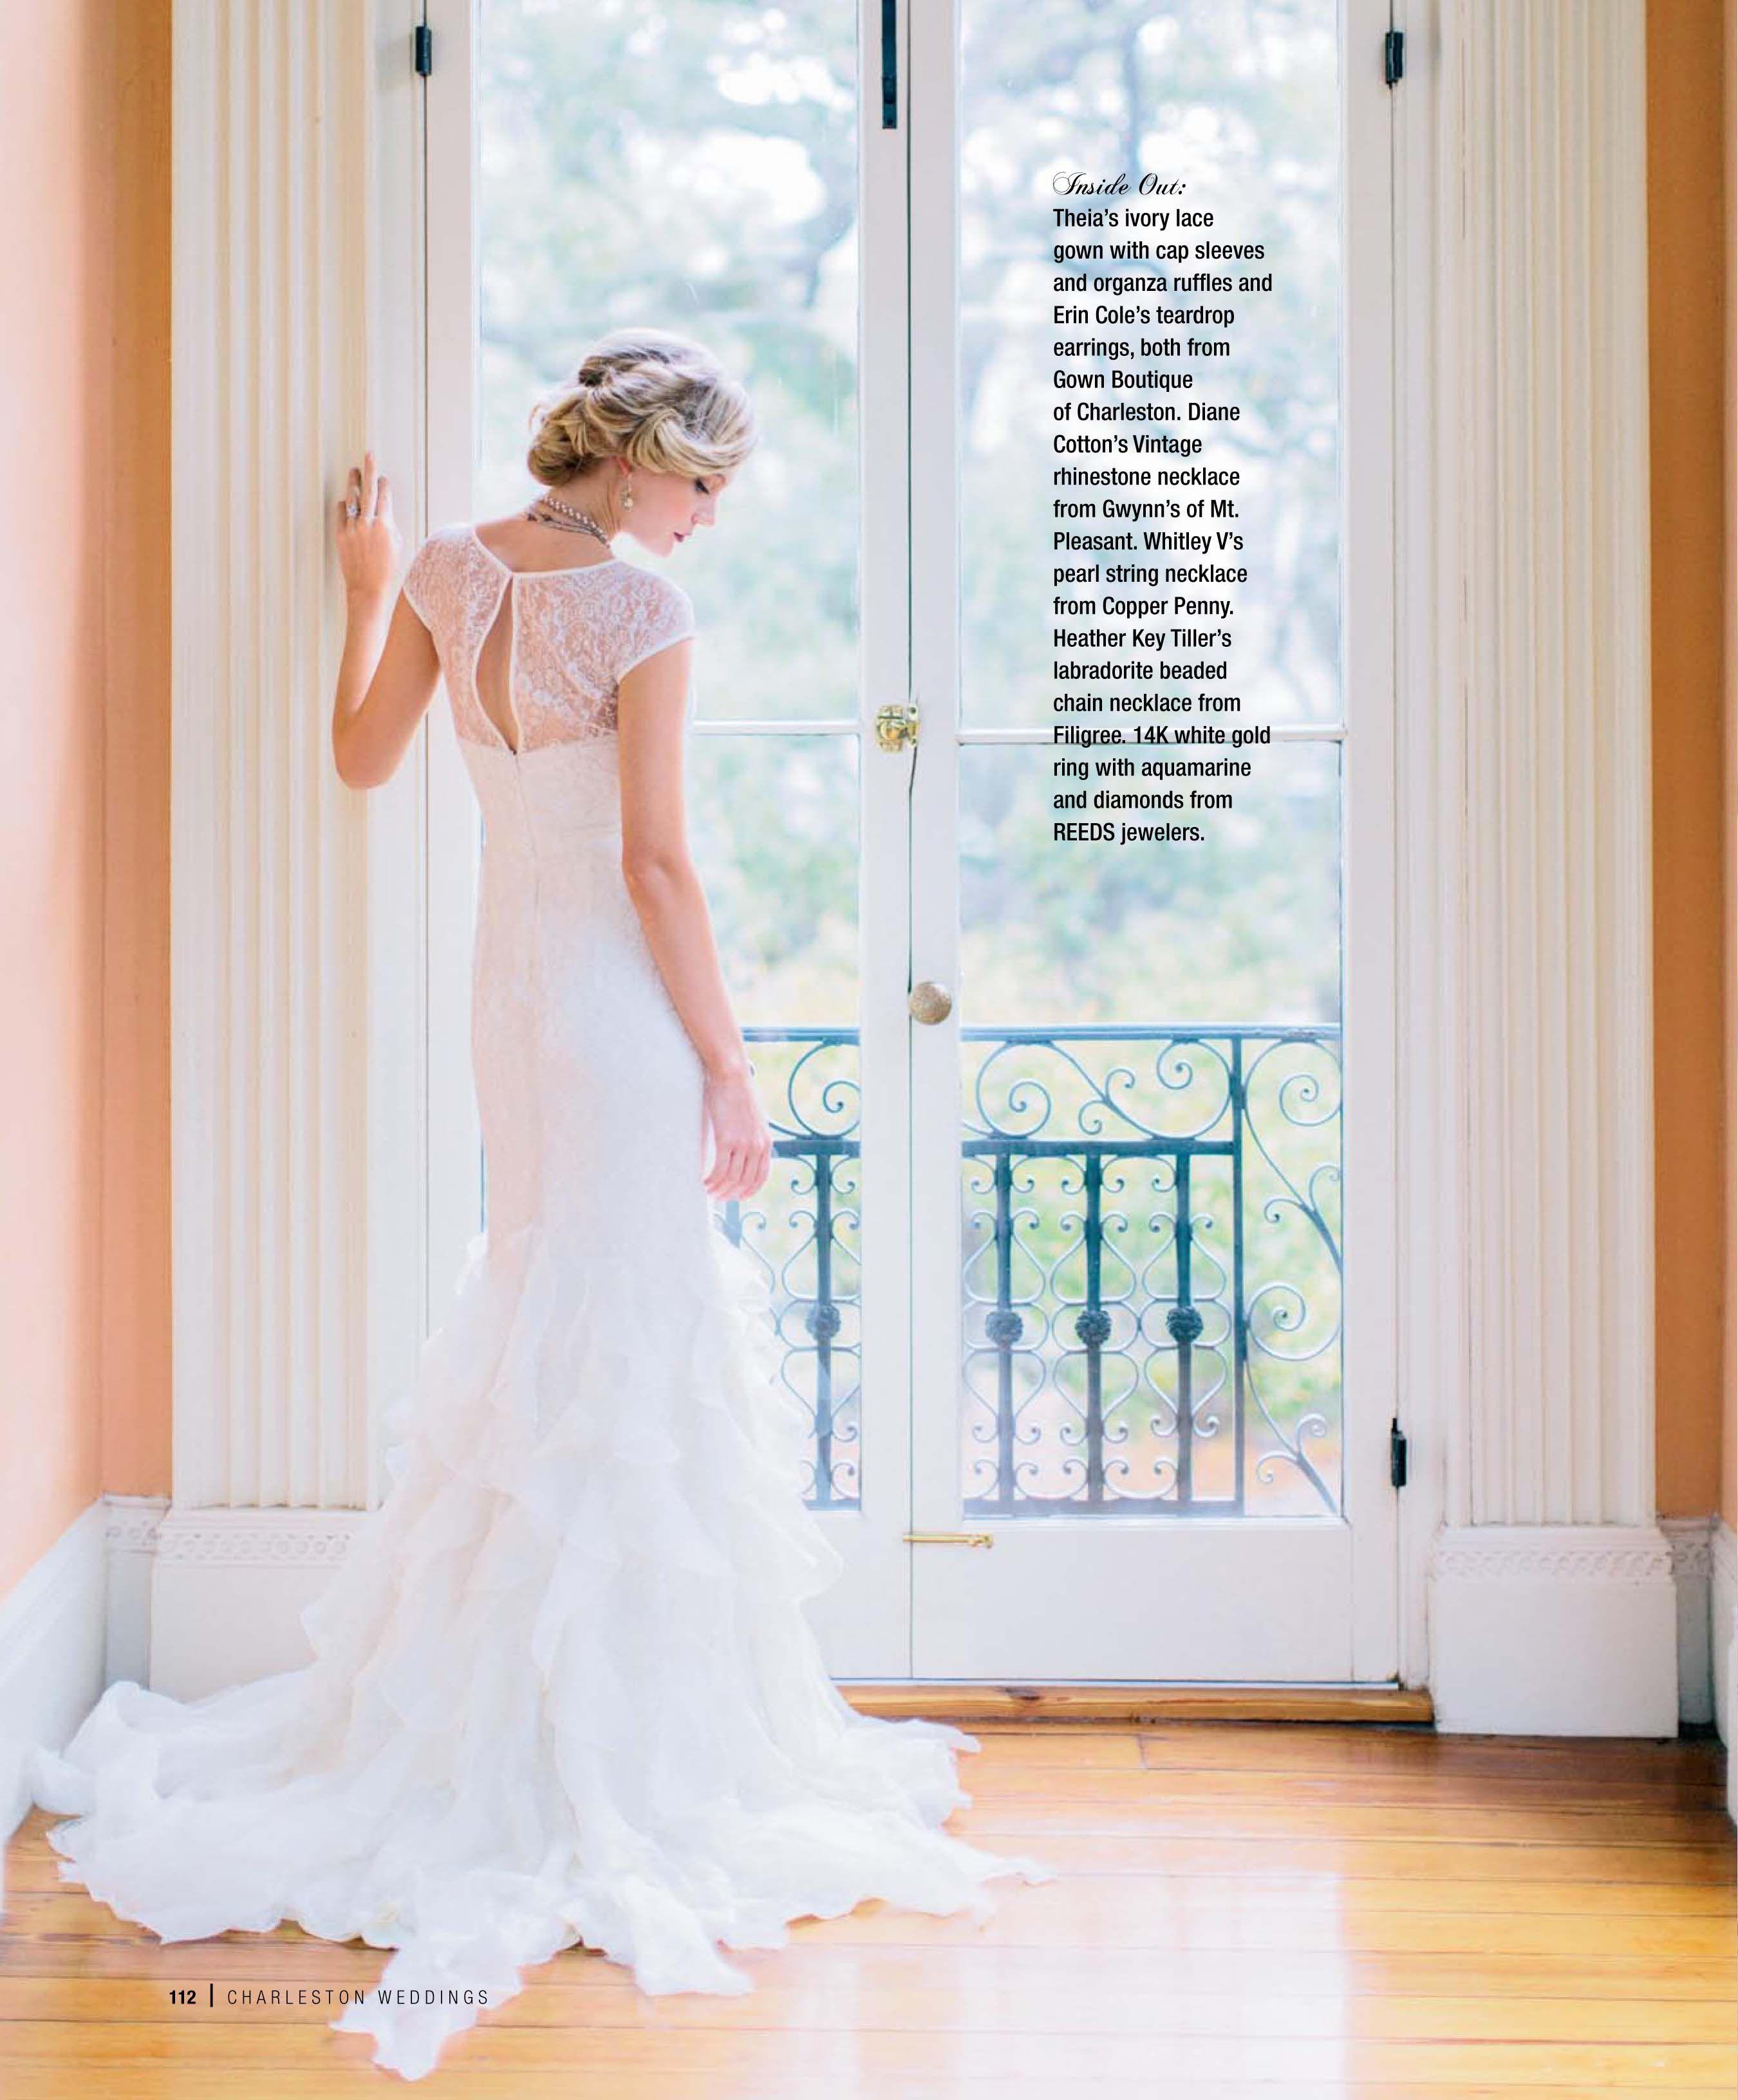 Theia wedding dresses  THEIA featured in CharlestonWeddings  weddings  Pinterest  Lace